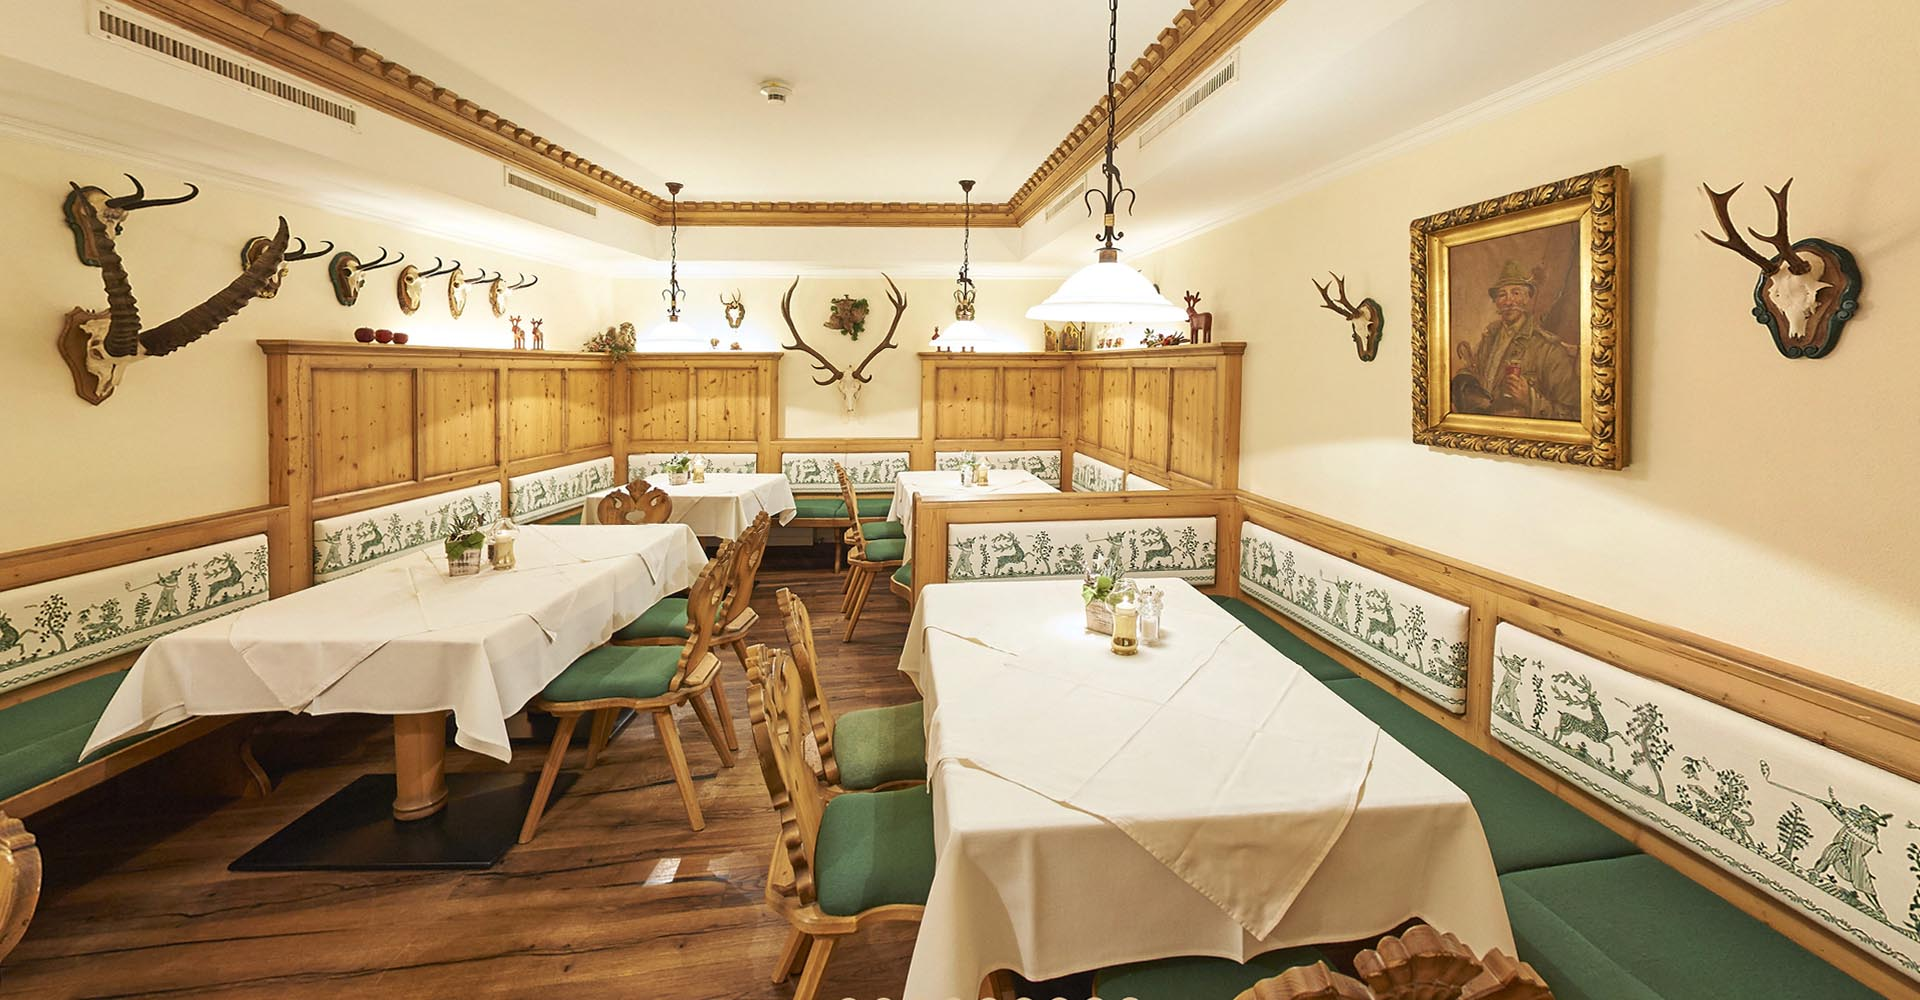 Kulinarium im Wagrainerhof, Wagrain, Salzburger Land